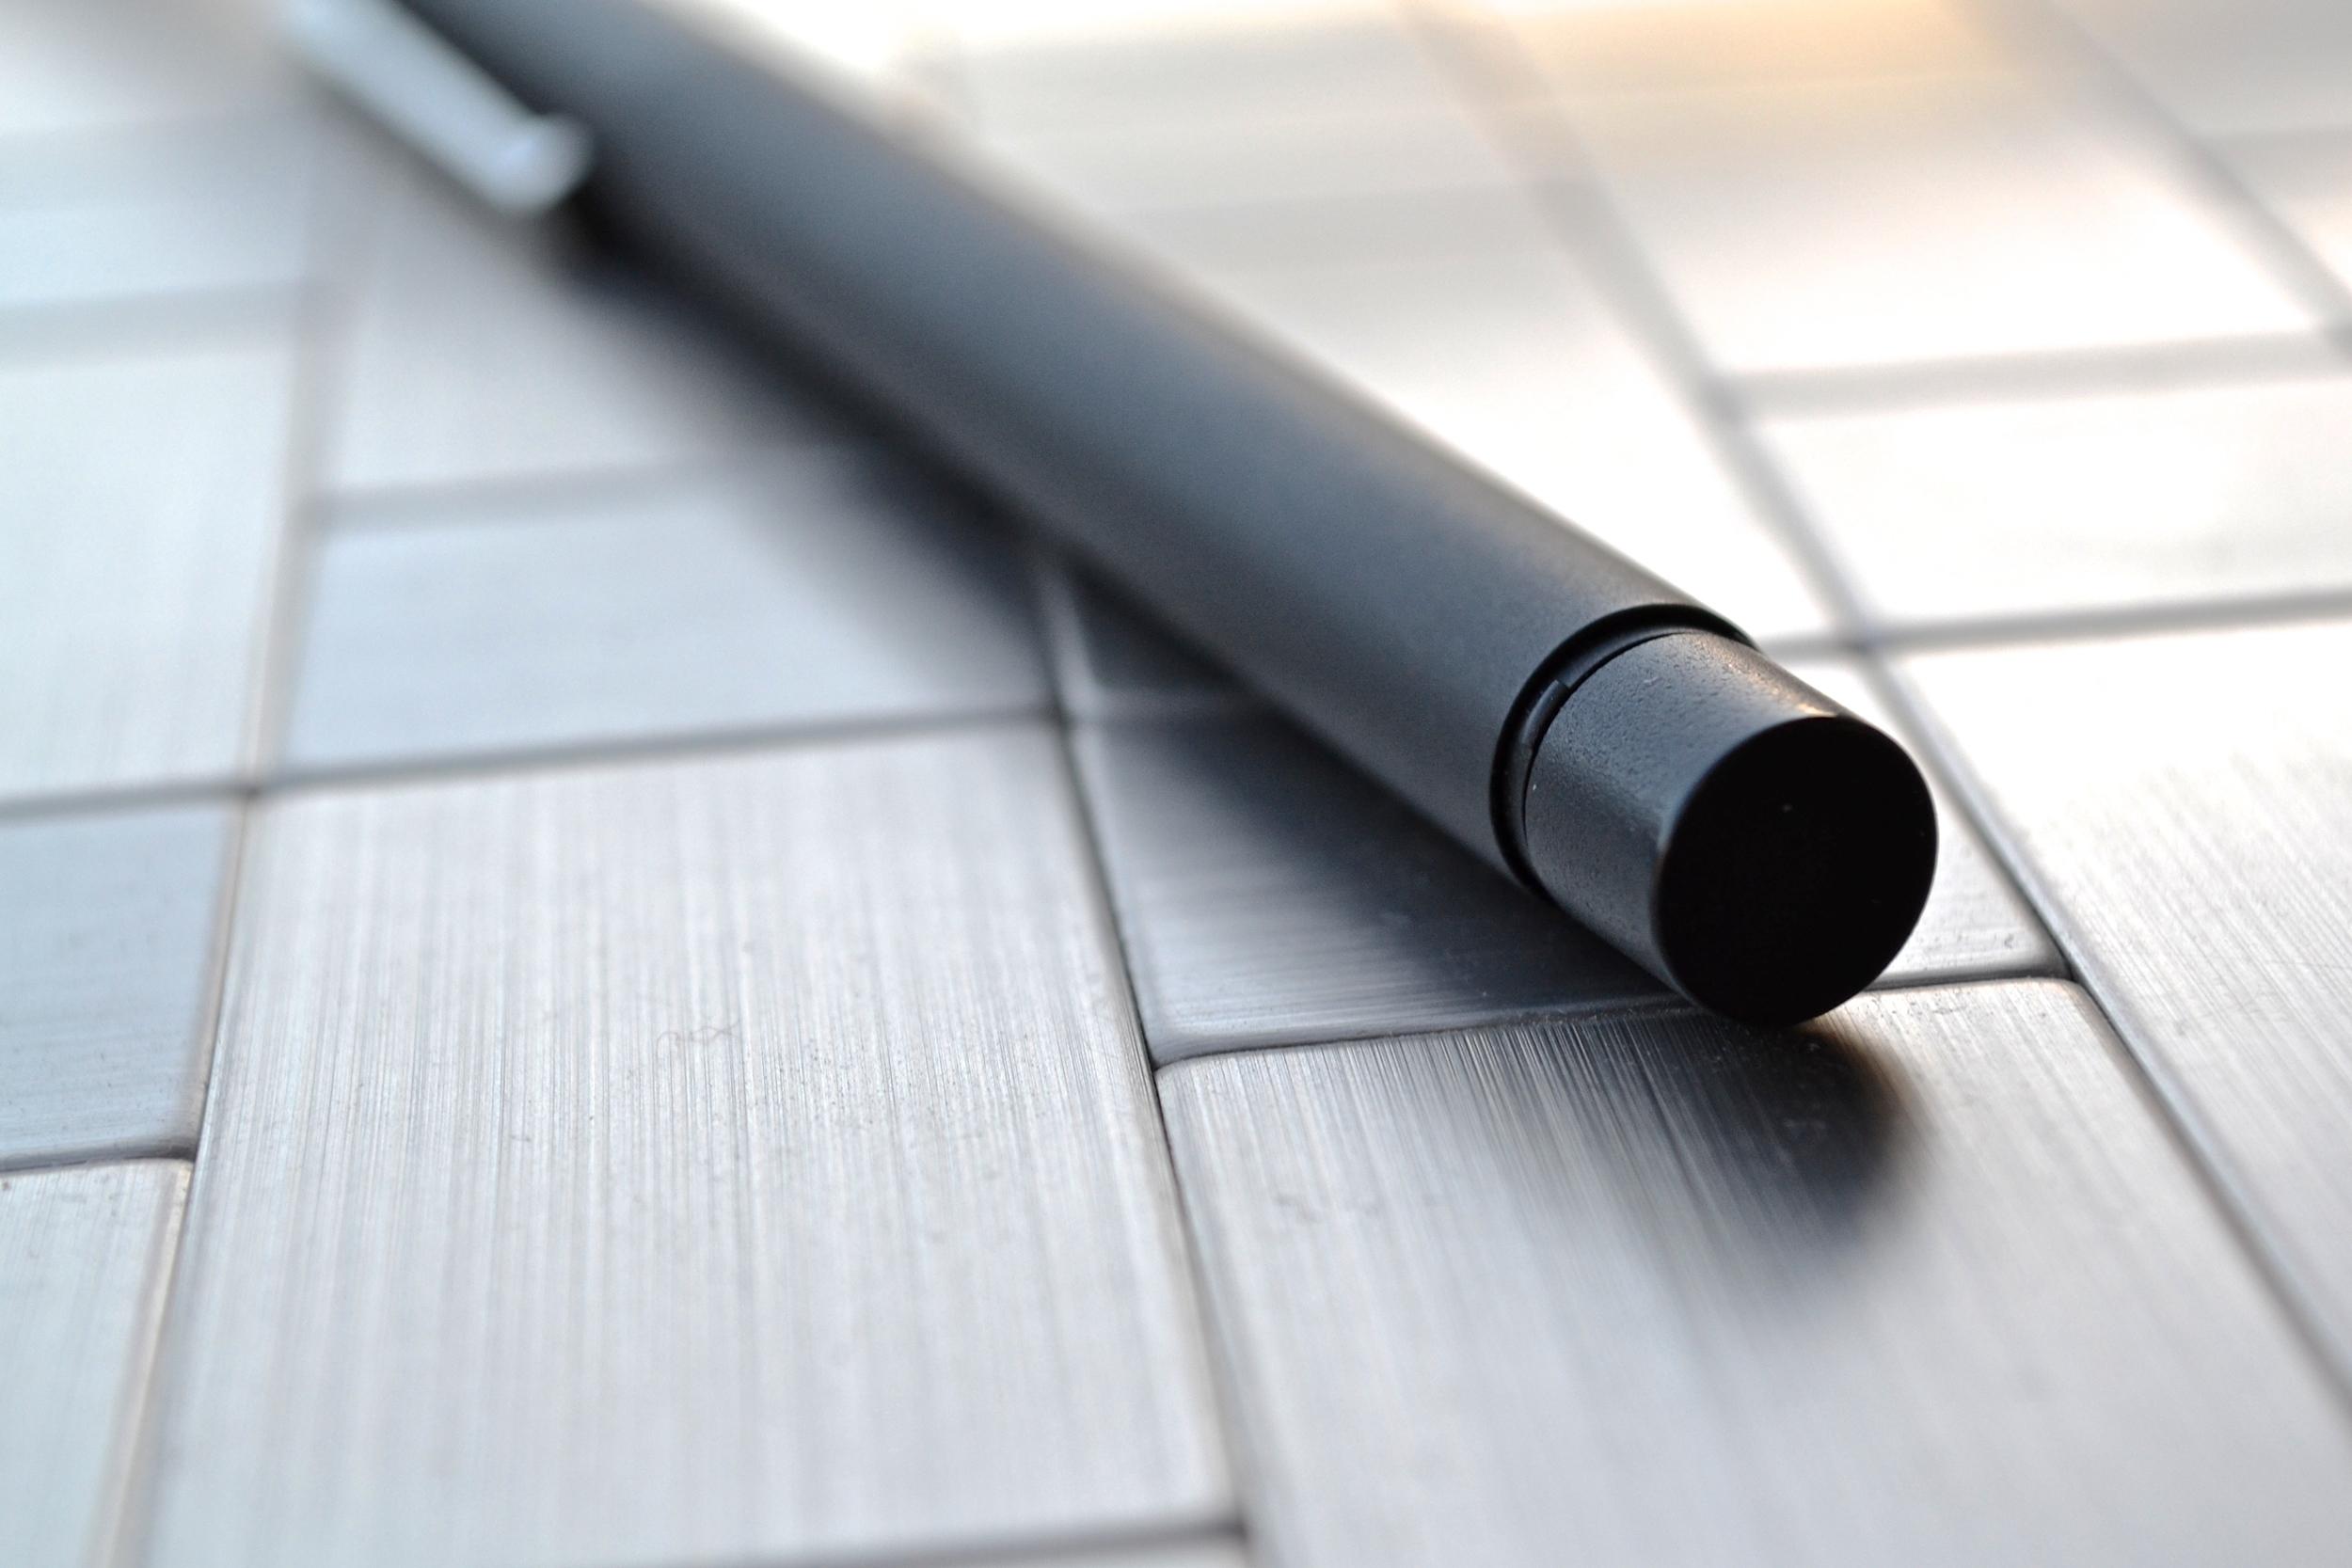 Lamy CP1 Fountain Pen Review